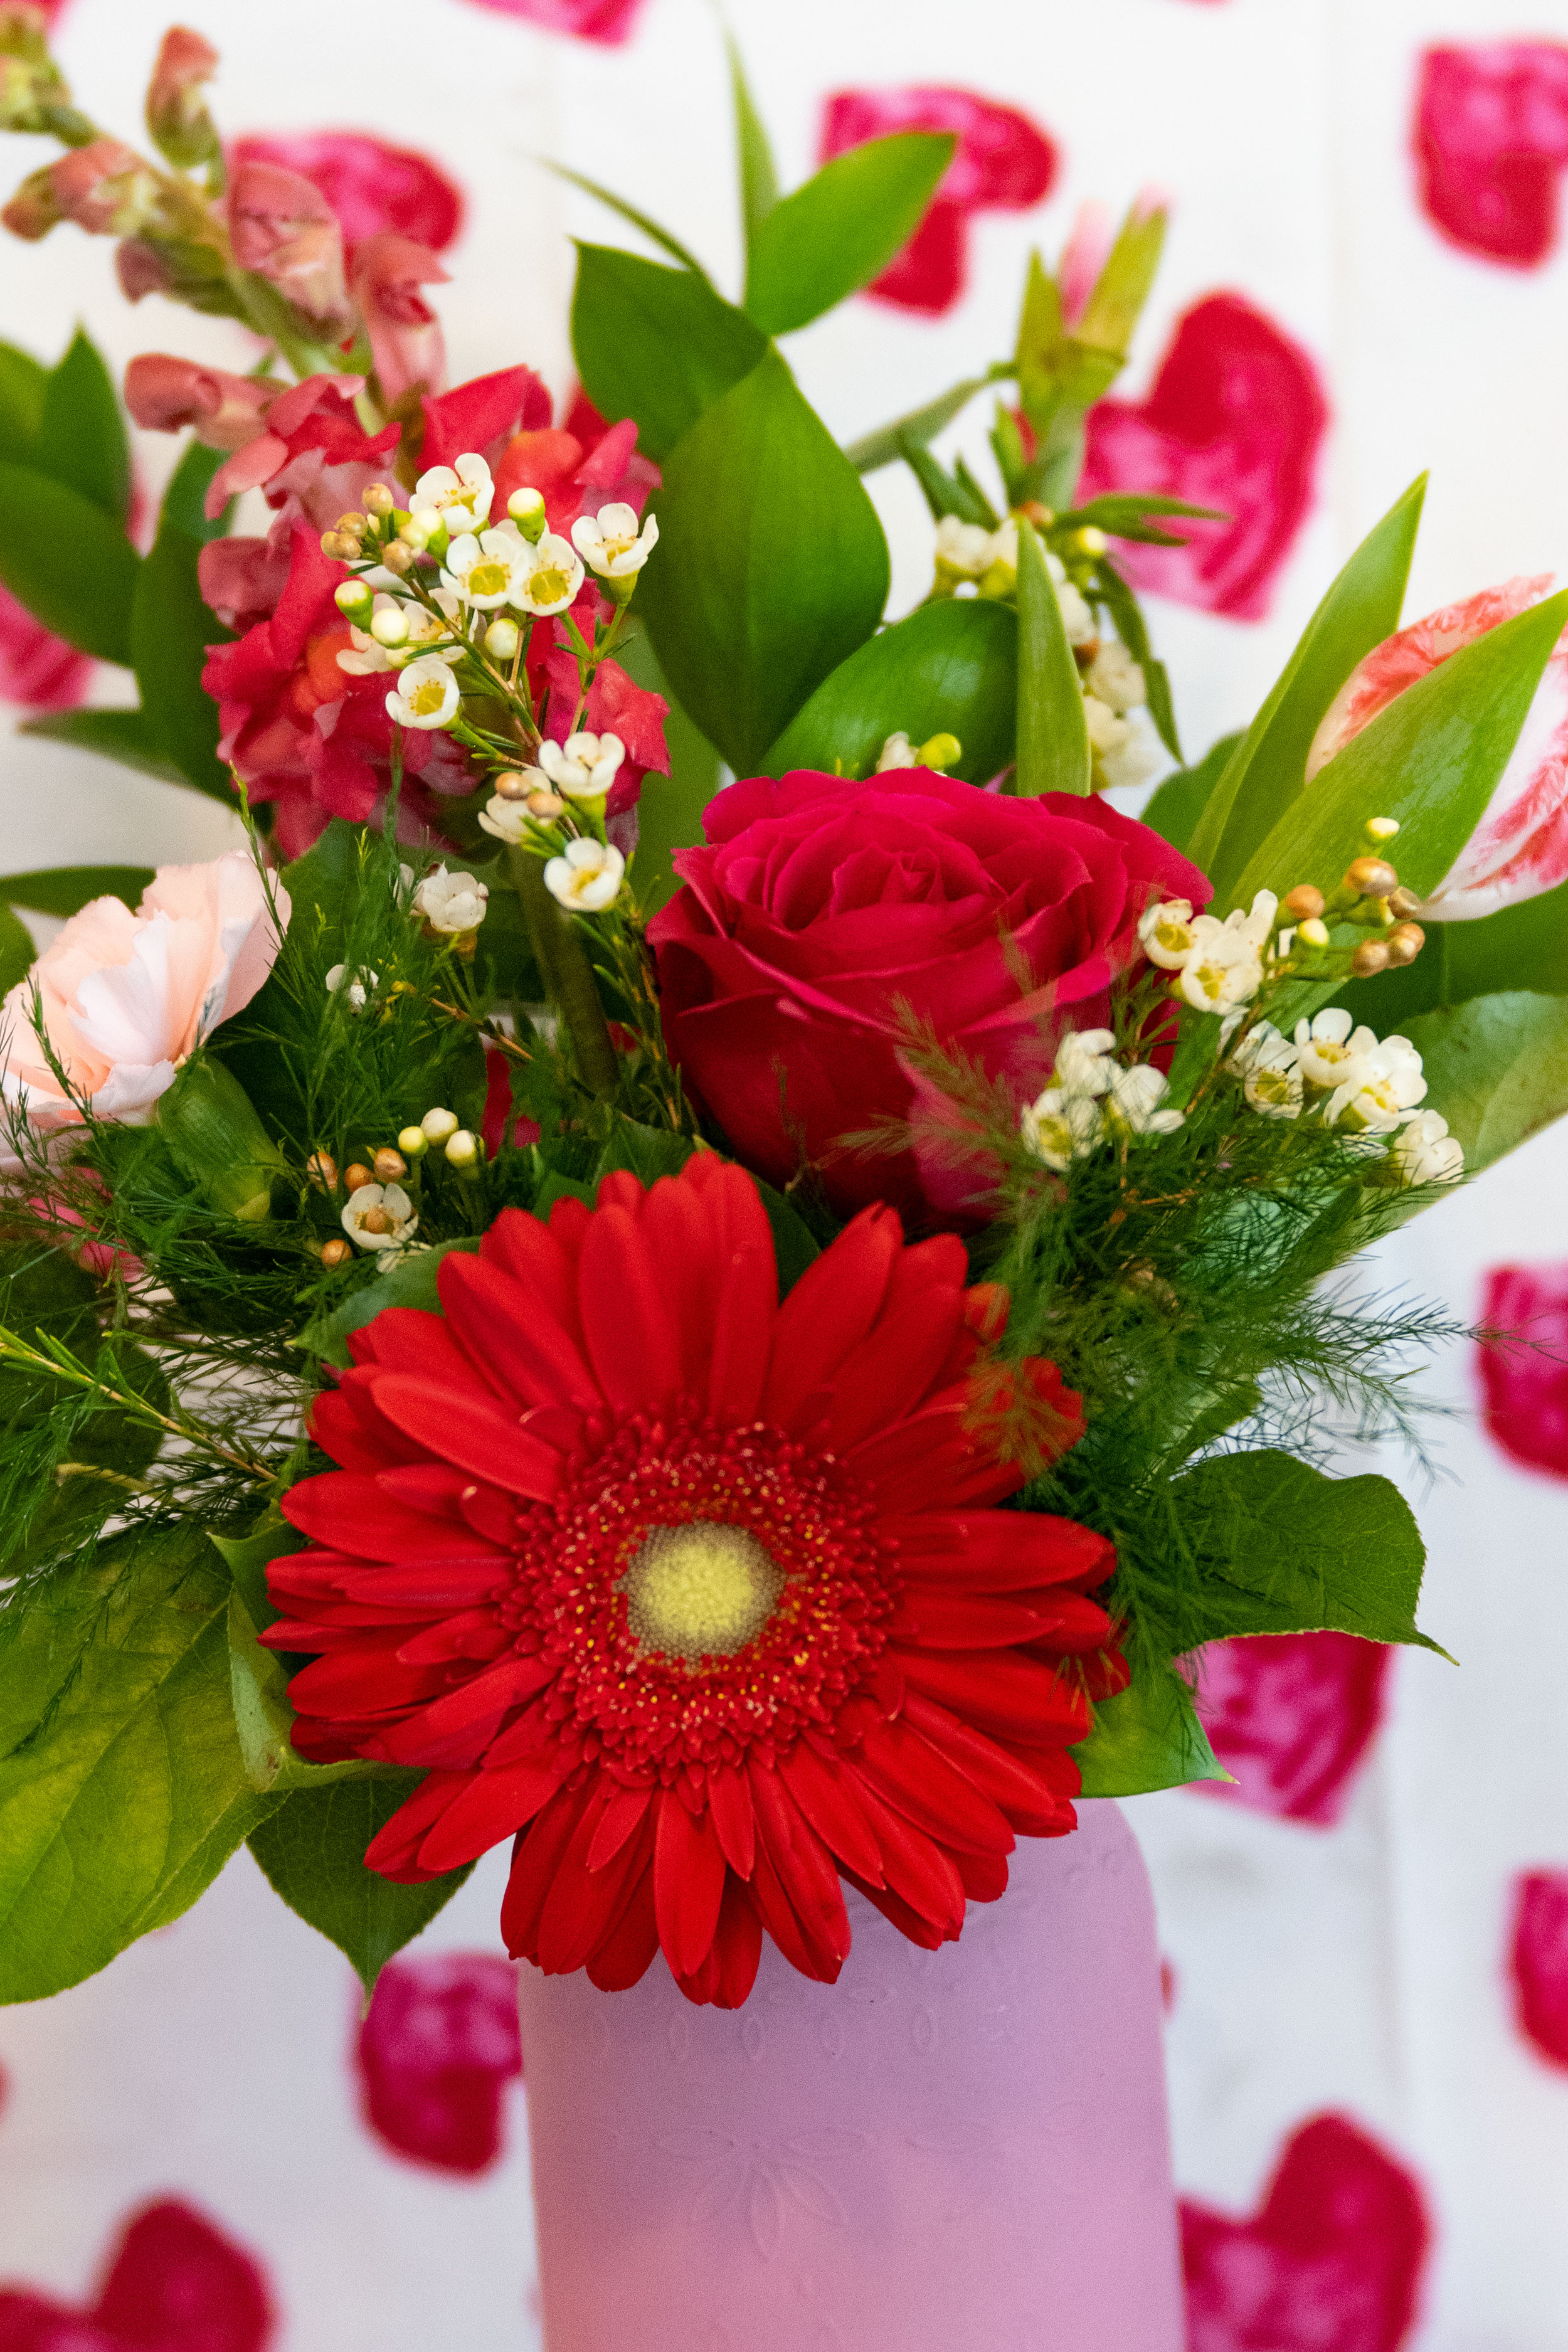 Sweet Love in a Mason Jar arrangement for Valentine's Day ideas, Durango, Colorado